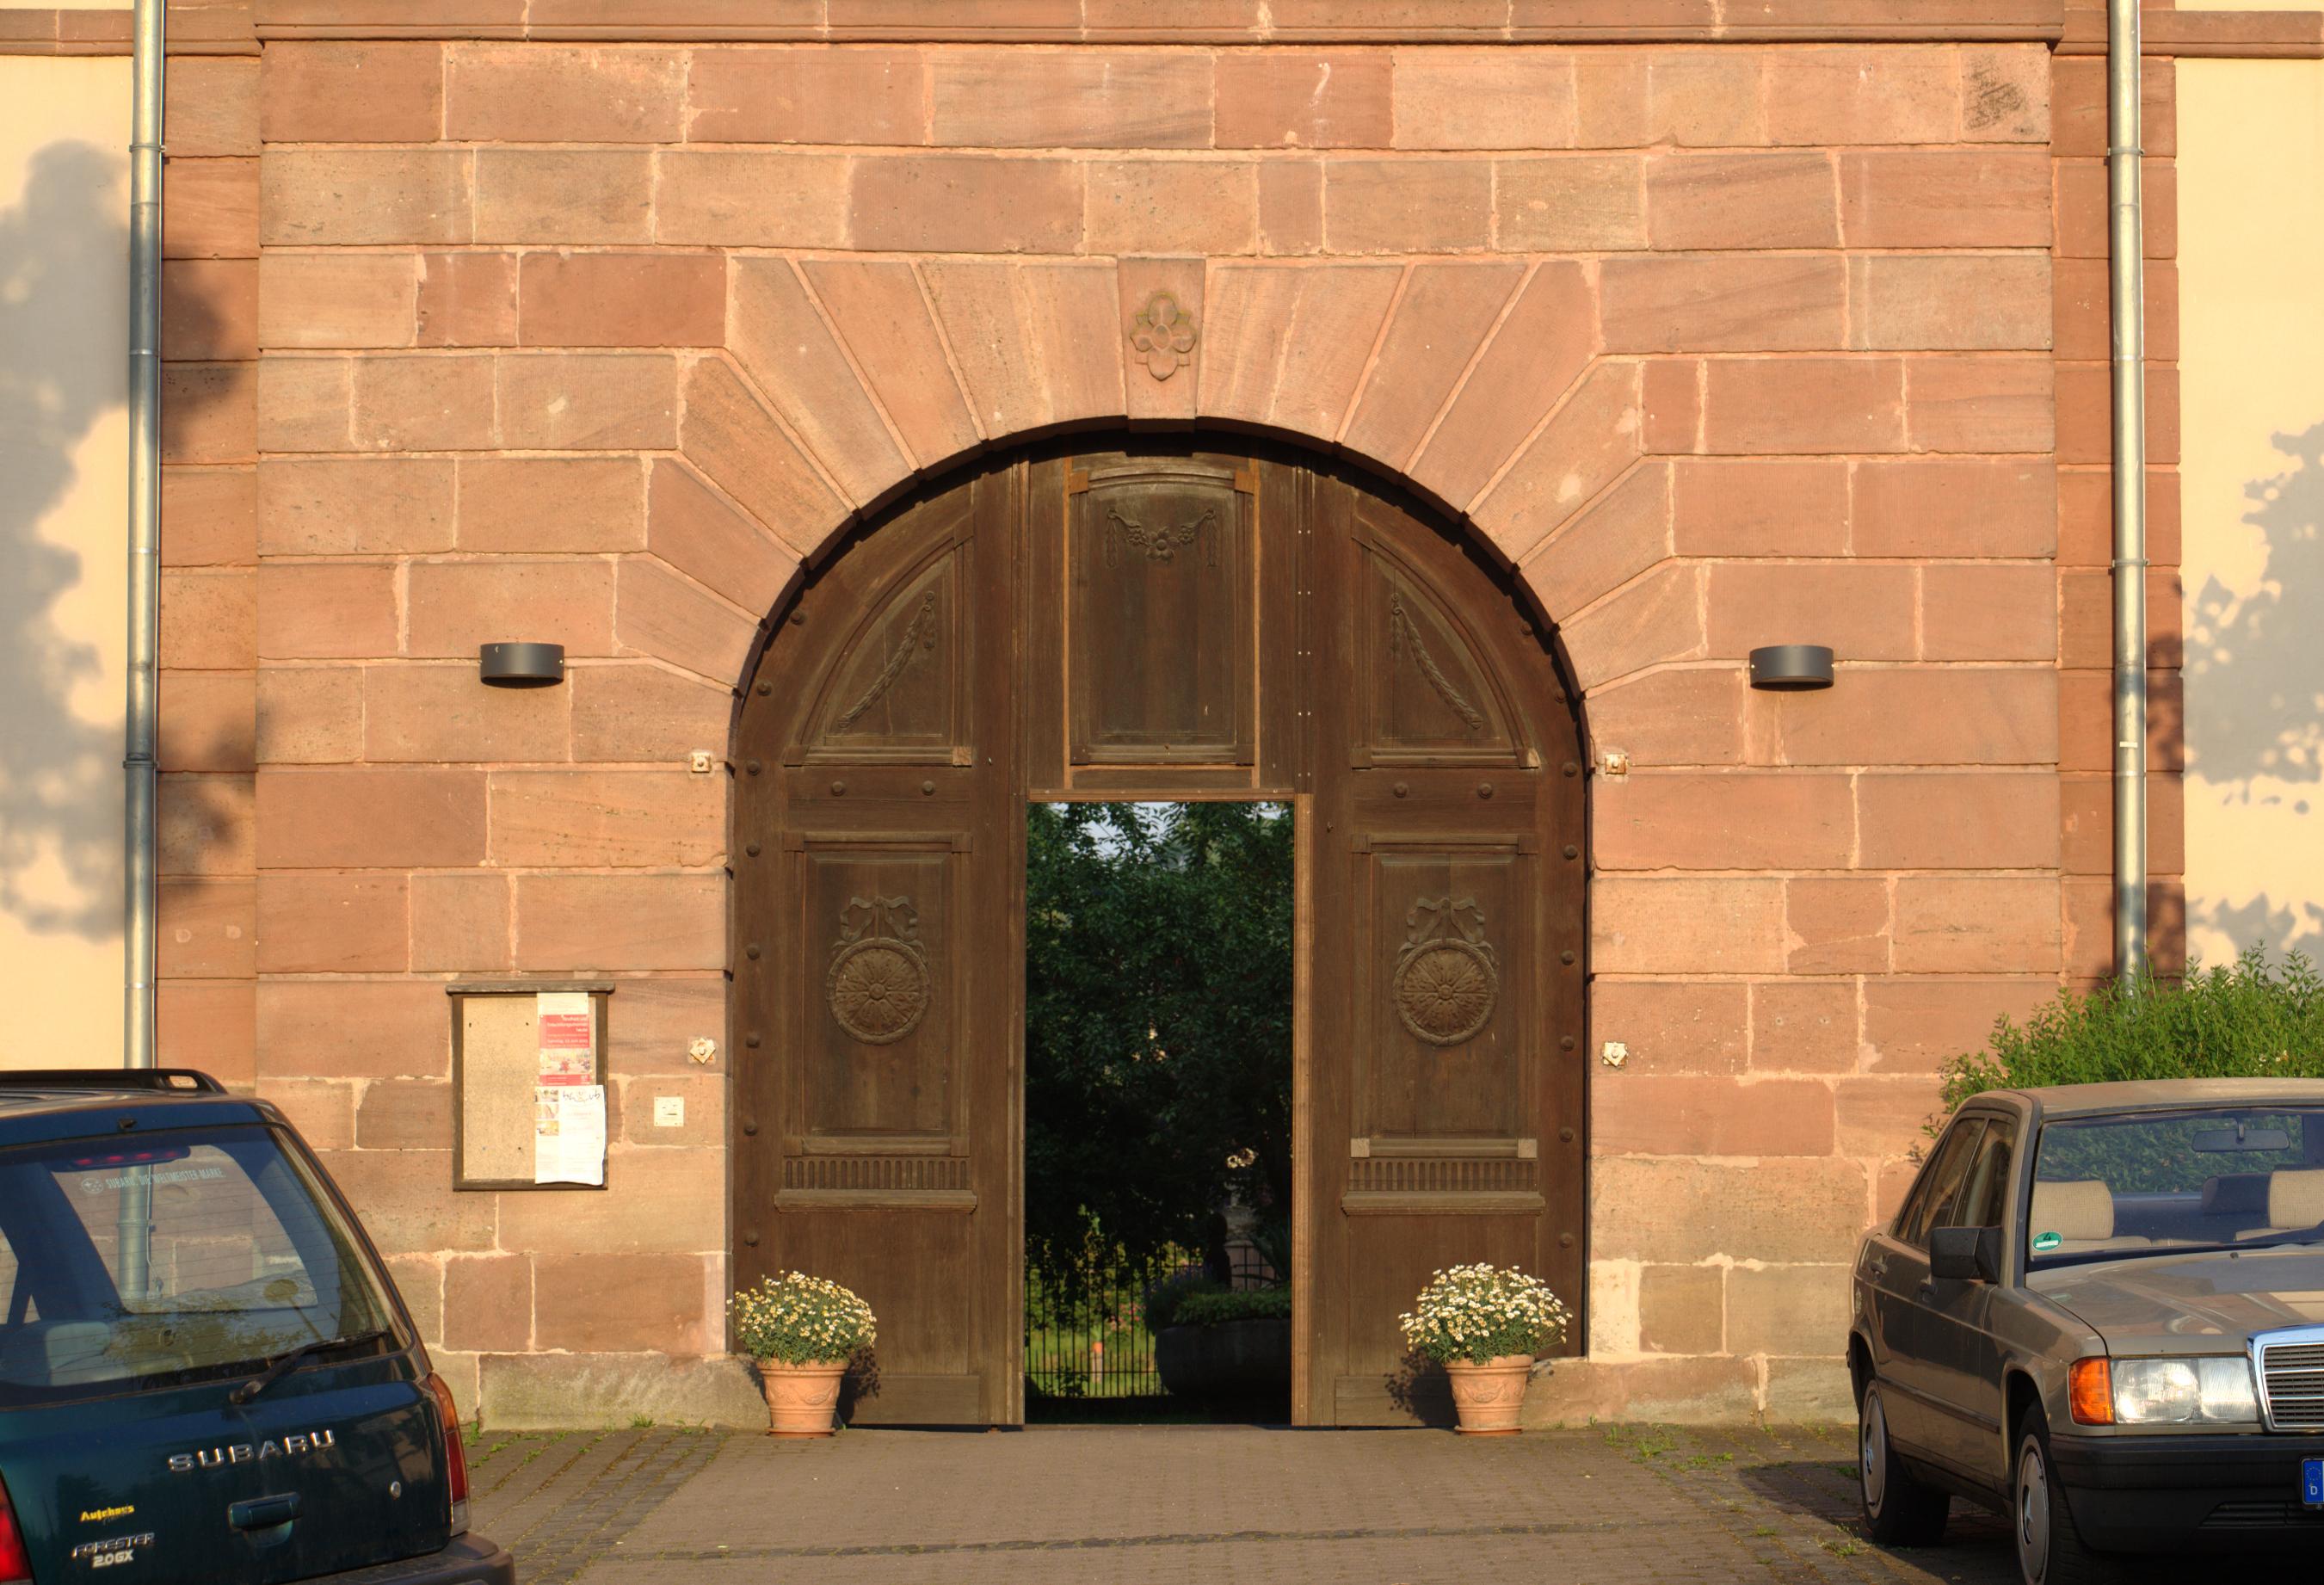 FileHerbstein Stockhausen Schloss Portal Door.png & File:Herbstein Stockhausen Schloss Portal Door.png - Wikimedia Commons